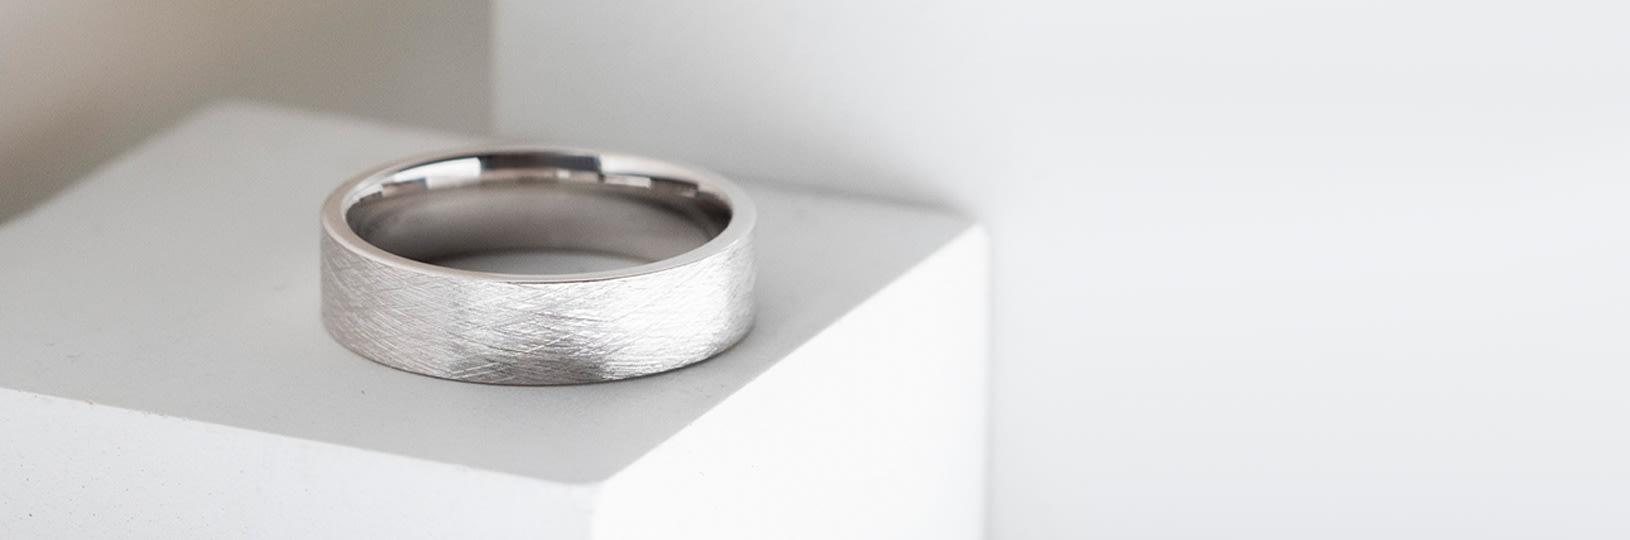 A men's wedding band in titanium